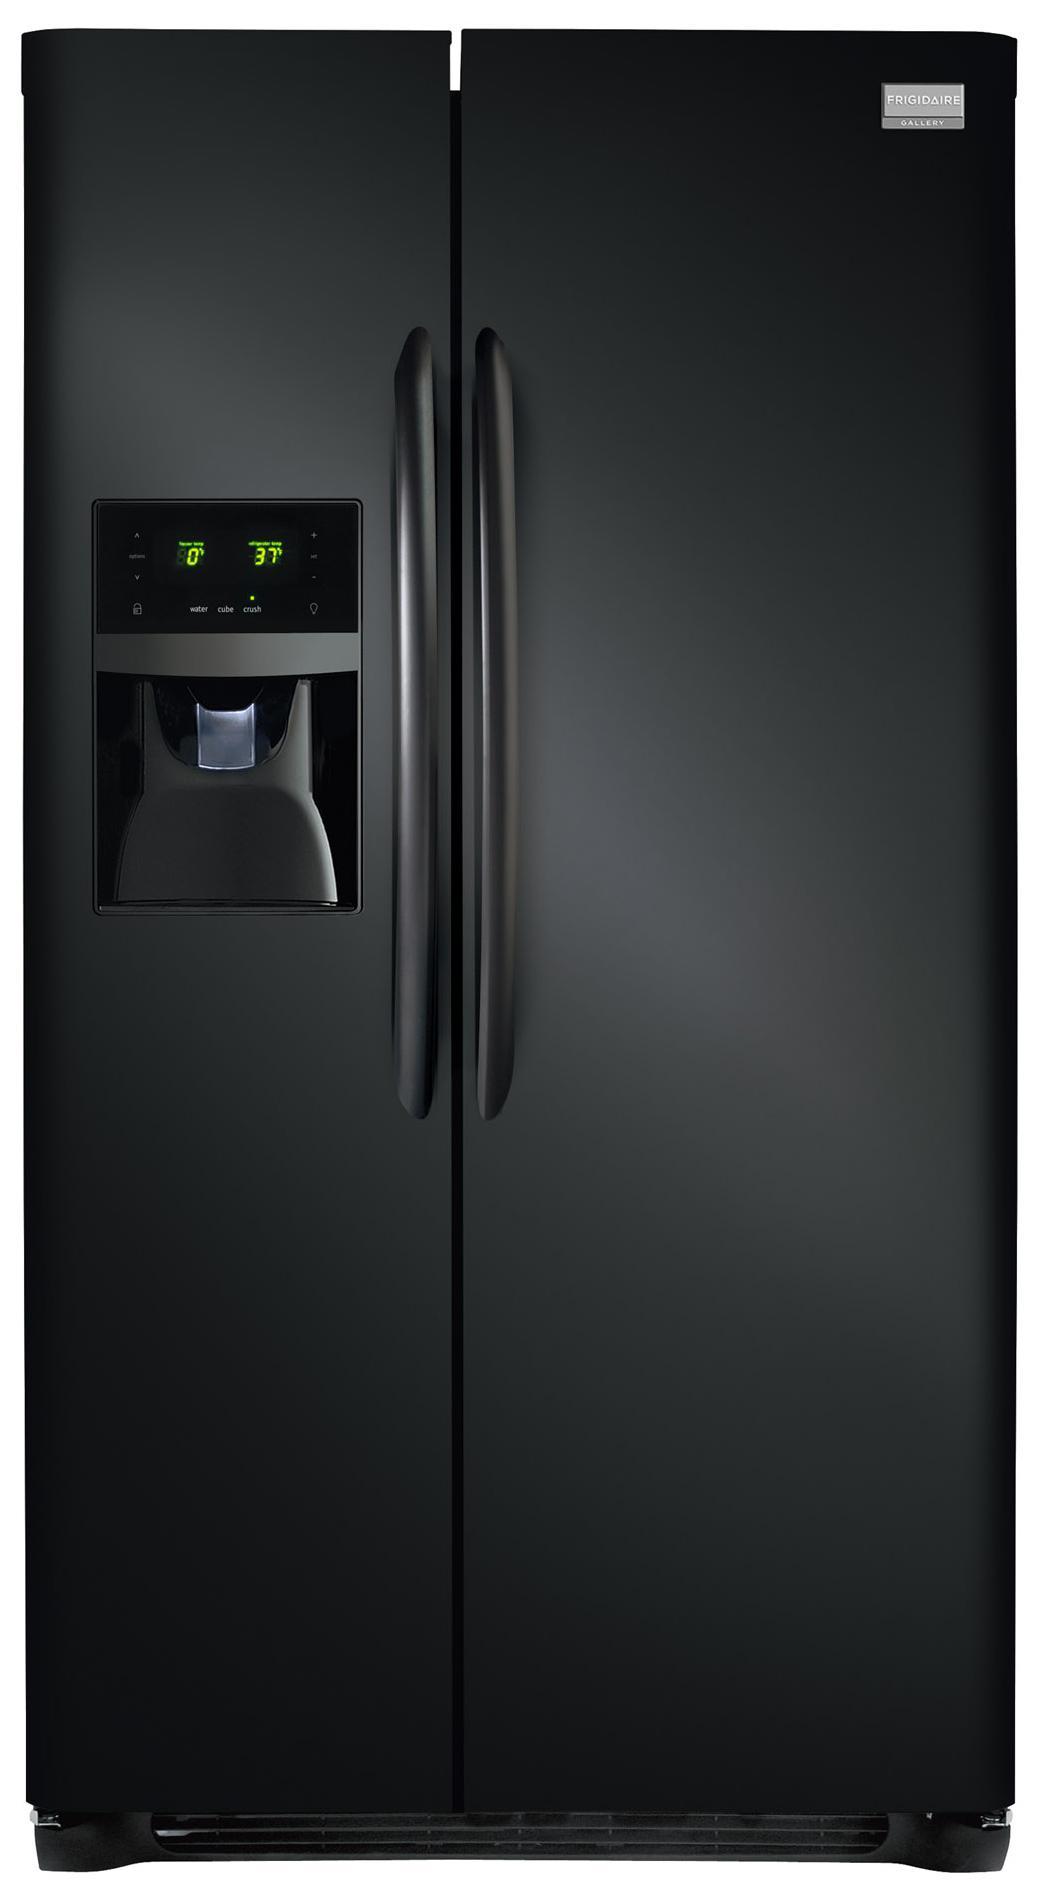 Frigidaire Gallery Refrigerators 26 Cu. Ft. Side-by-Side Refrigerator by Frigidaire at Furniture Fair - North Carolina